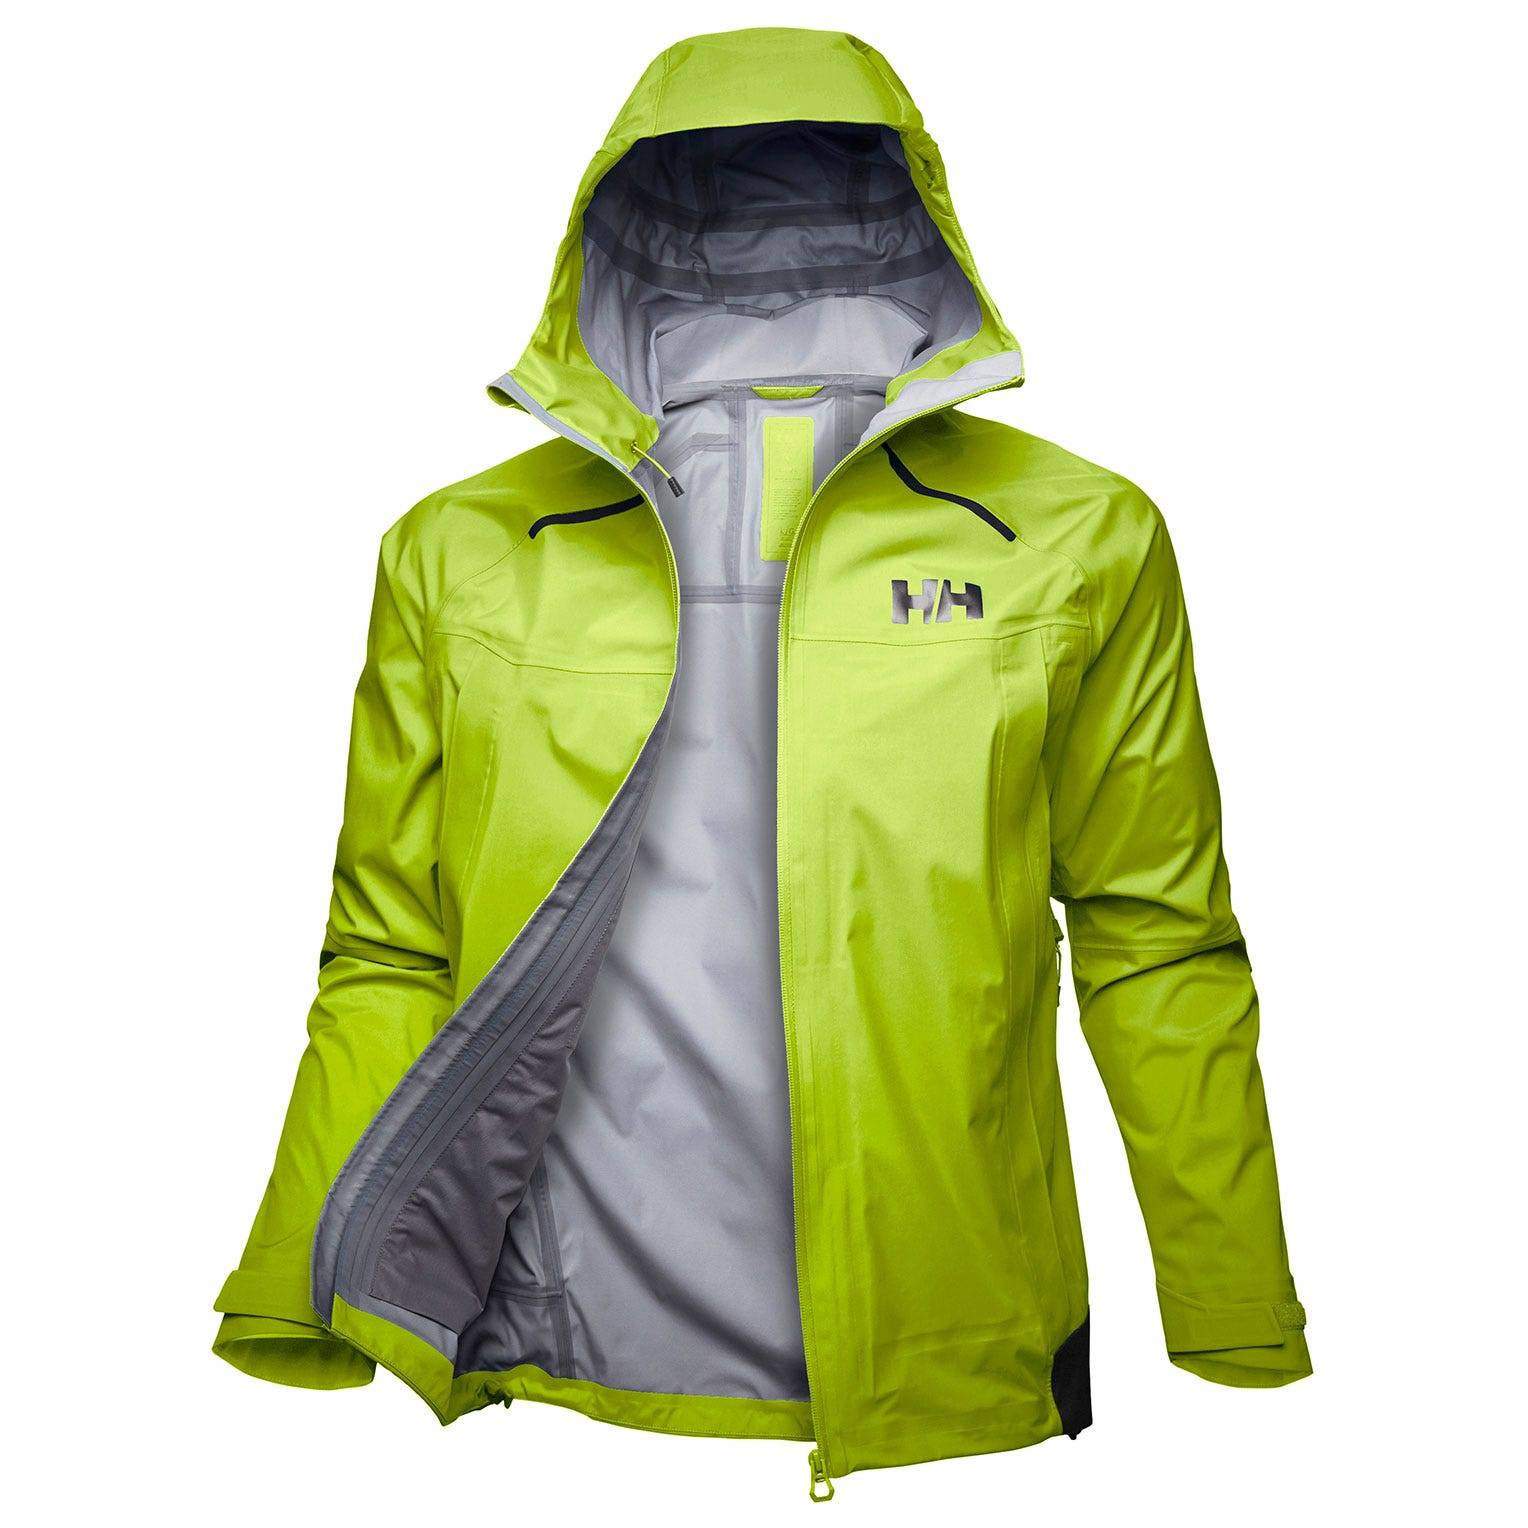 Helly Hansen Odin 9 Worlds Jacket Mens Hiking Yellow XL